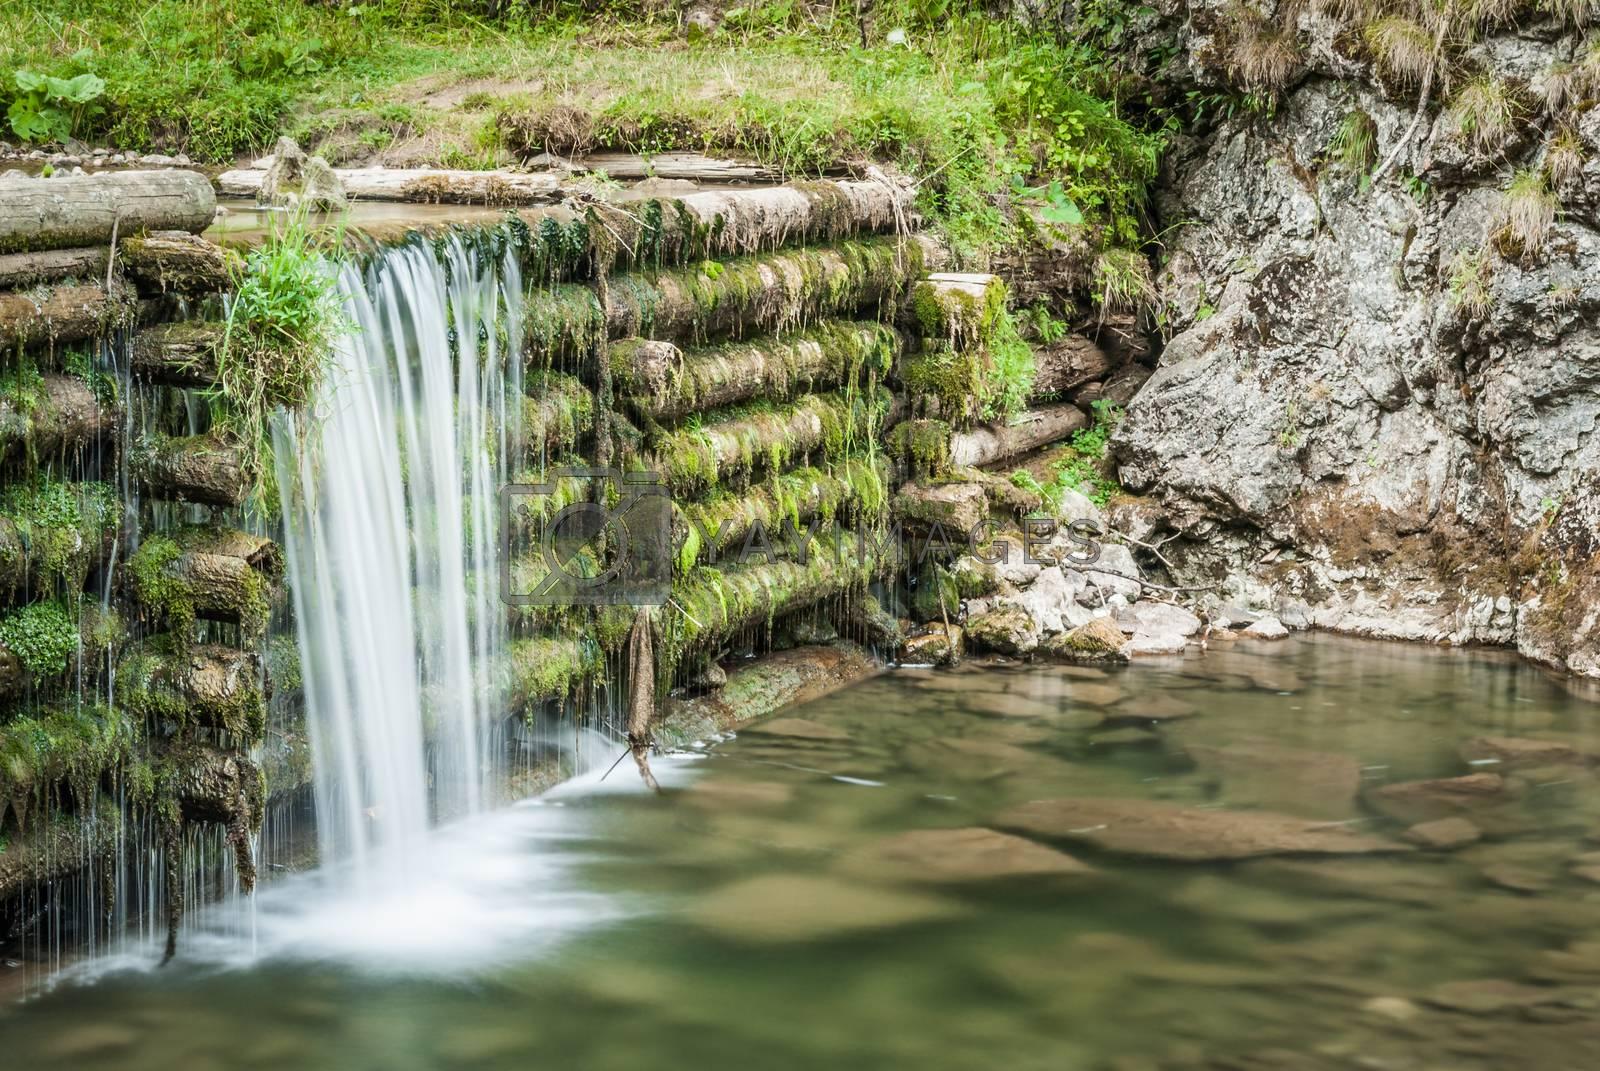 Royalty free image of man made waterfall by Kayco